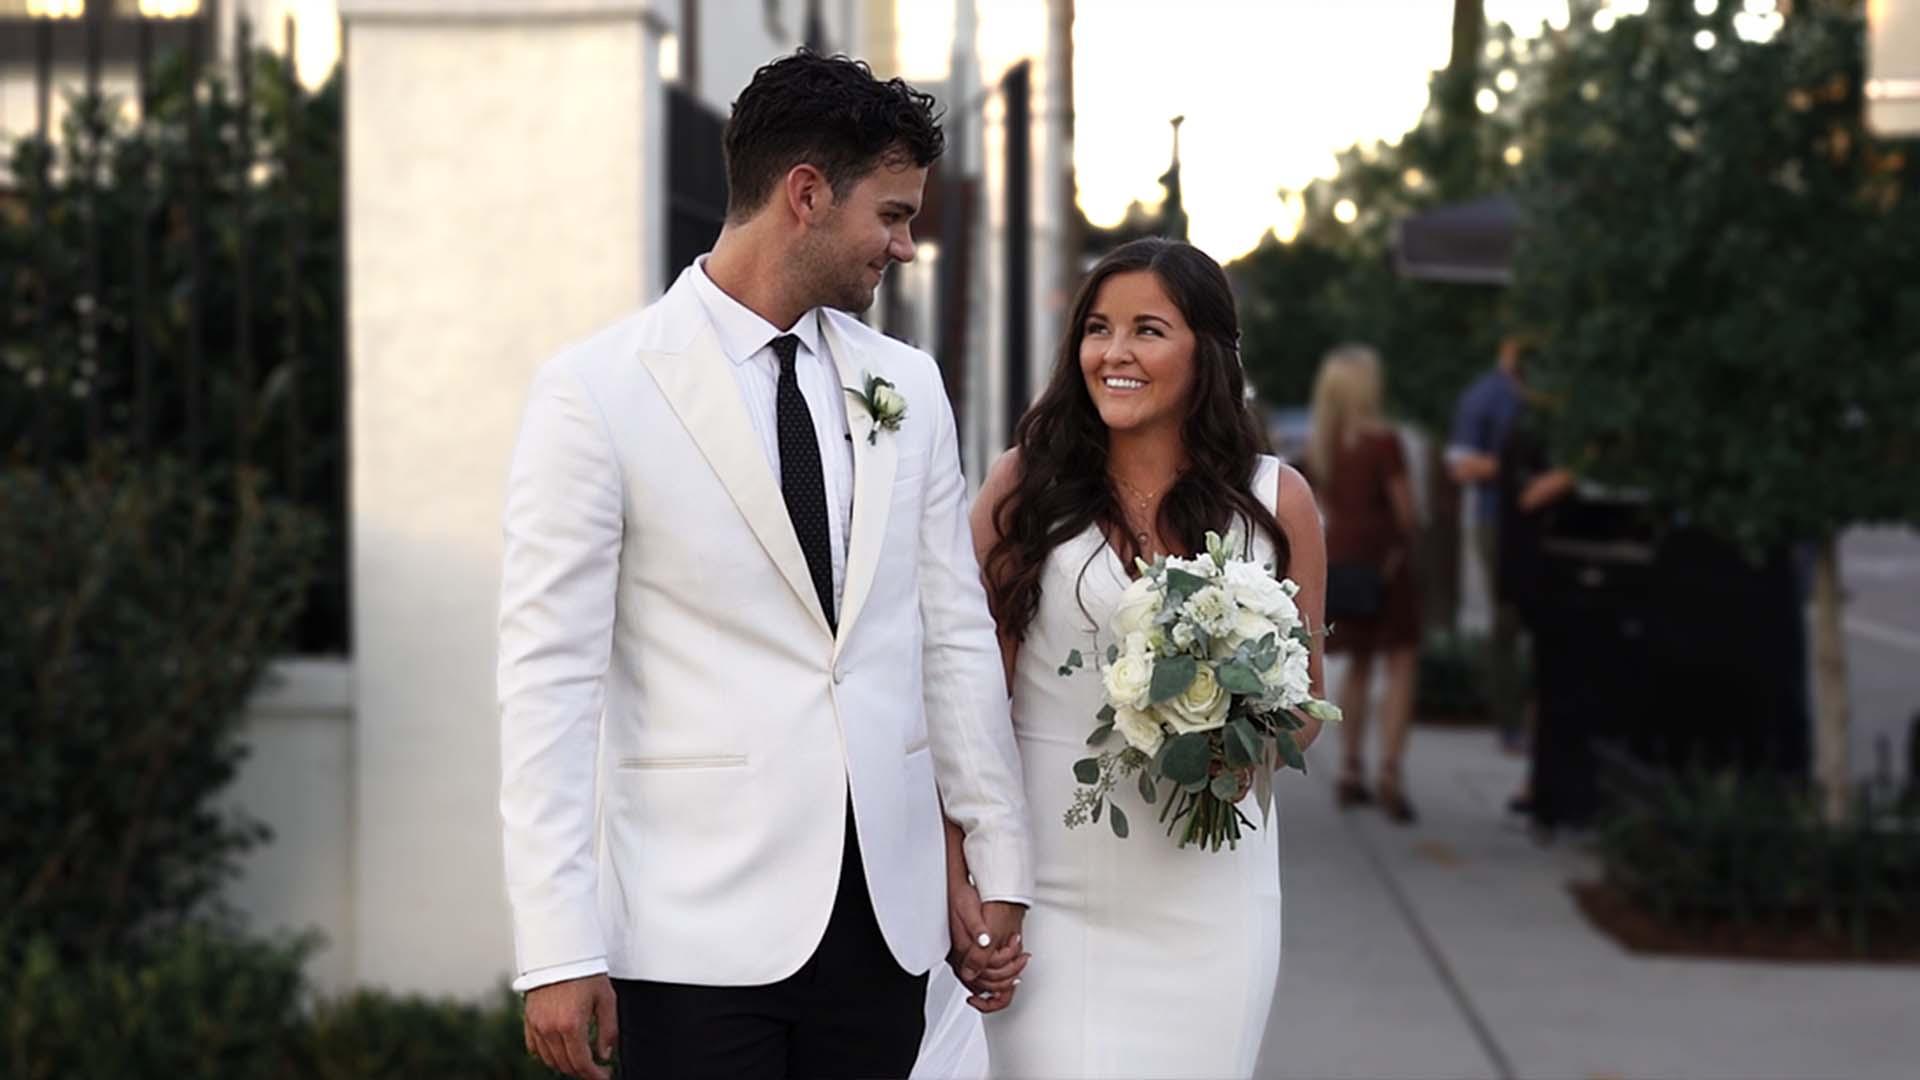 Bride and Groom Walking Down Sidewalk Next To Il Mercato Wedding Venue